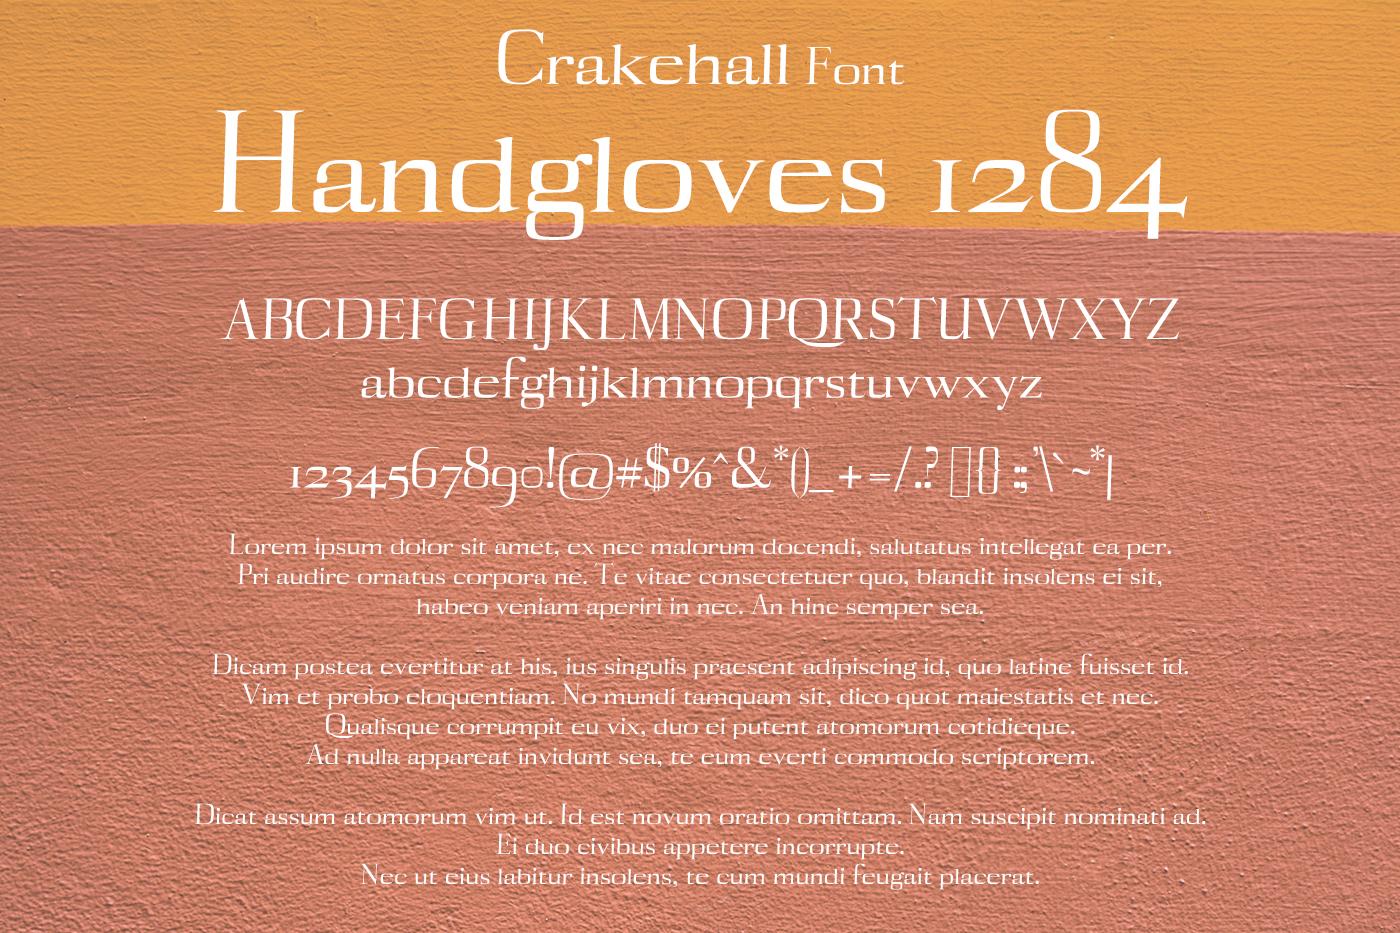 Crakehall Font example image 2